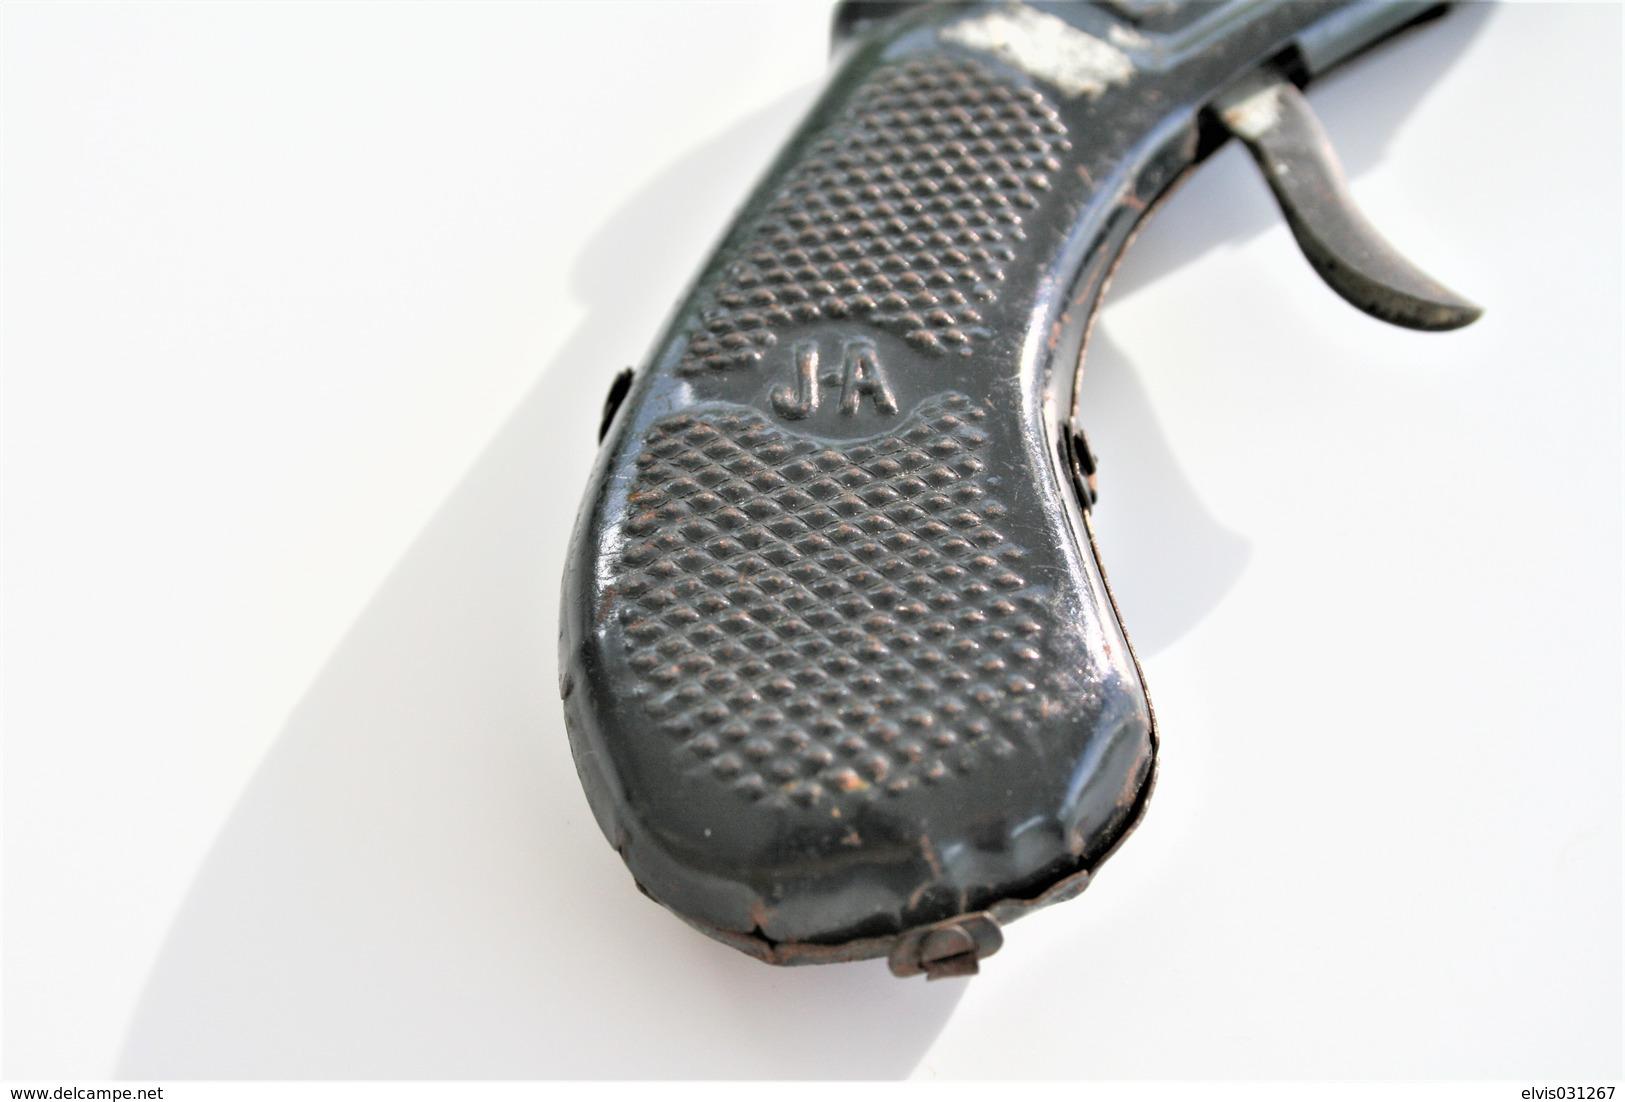 Vintage TOY GUN : J.A L'ADHERENT - L=17cm - 1930s - Keywords : Cap Gun - Cork Gun - Rifle - Revolver - Pistol - Tin - Decotatieve Wapens